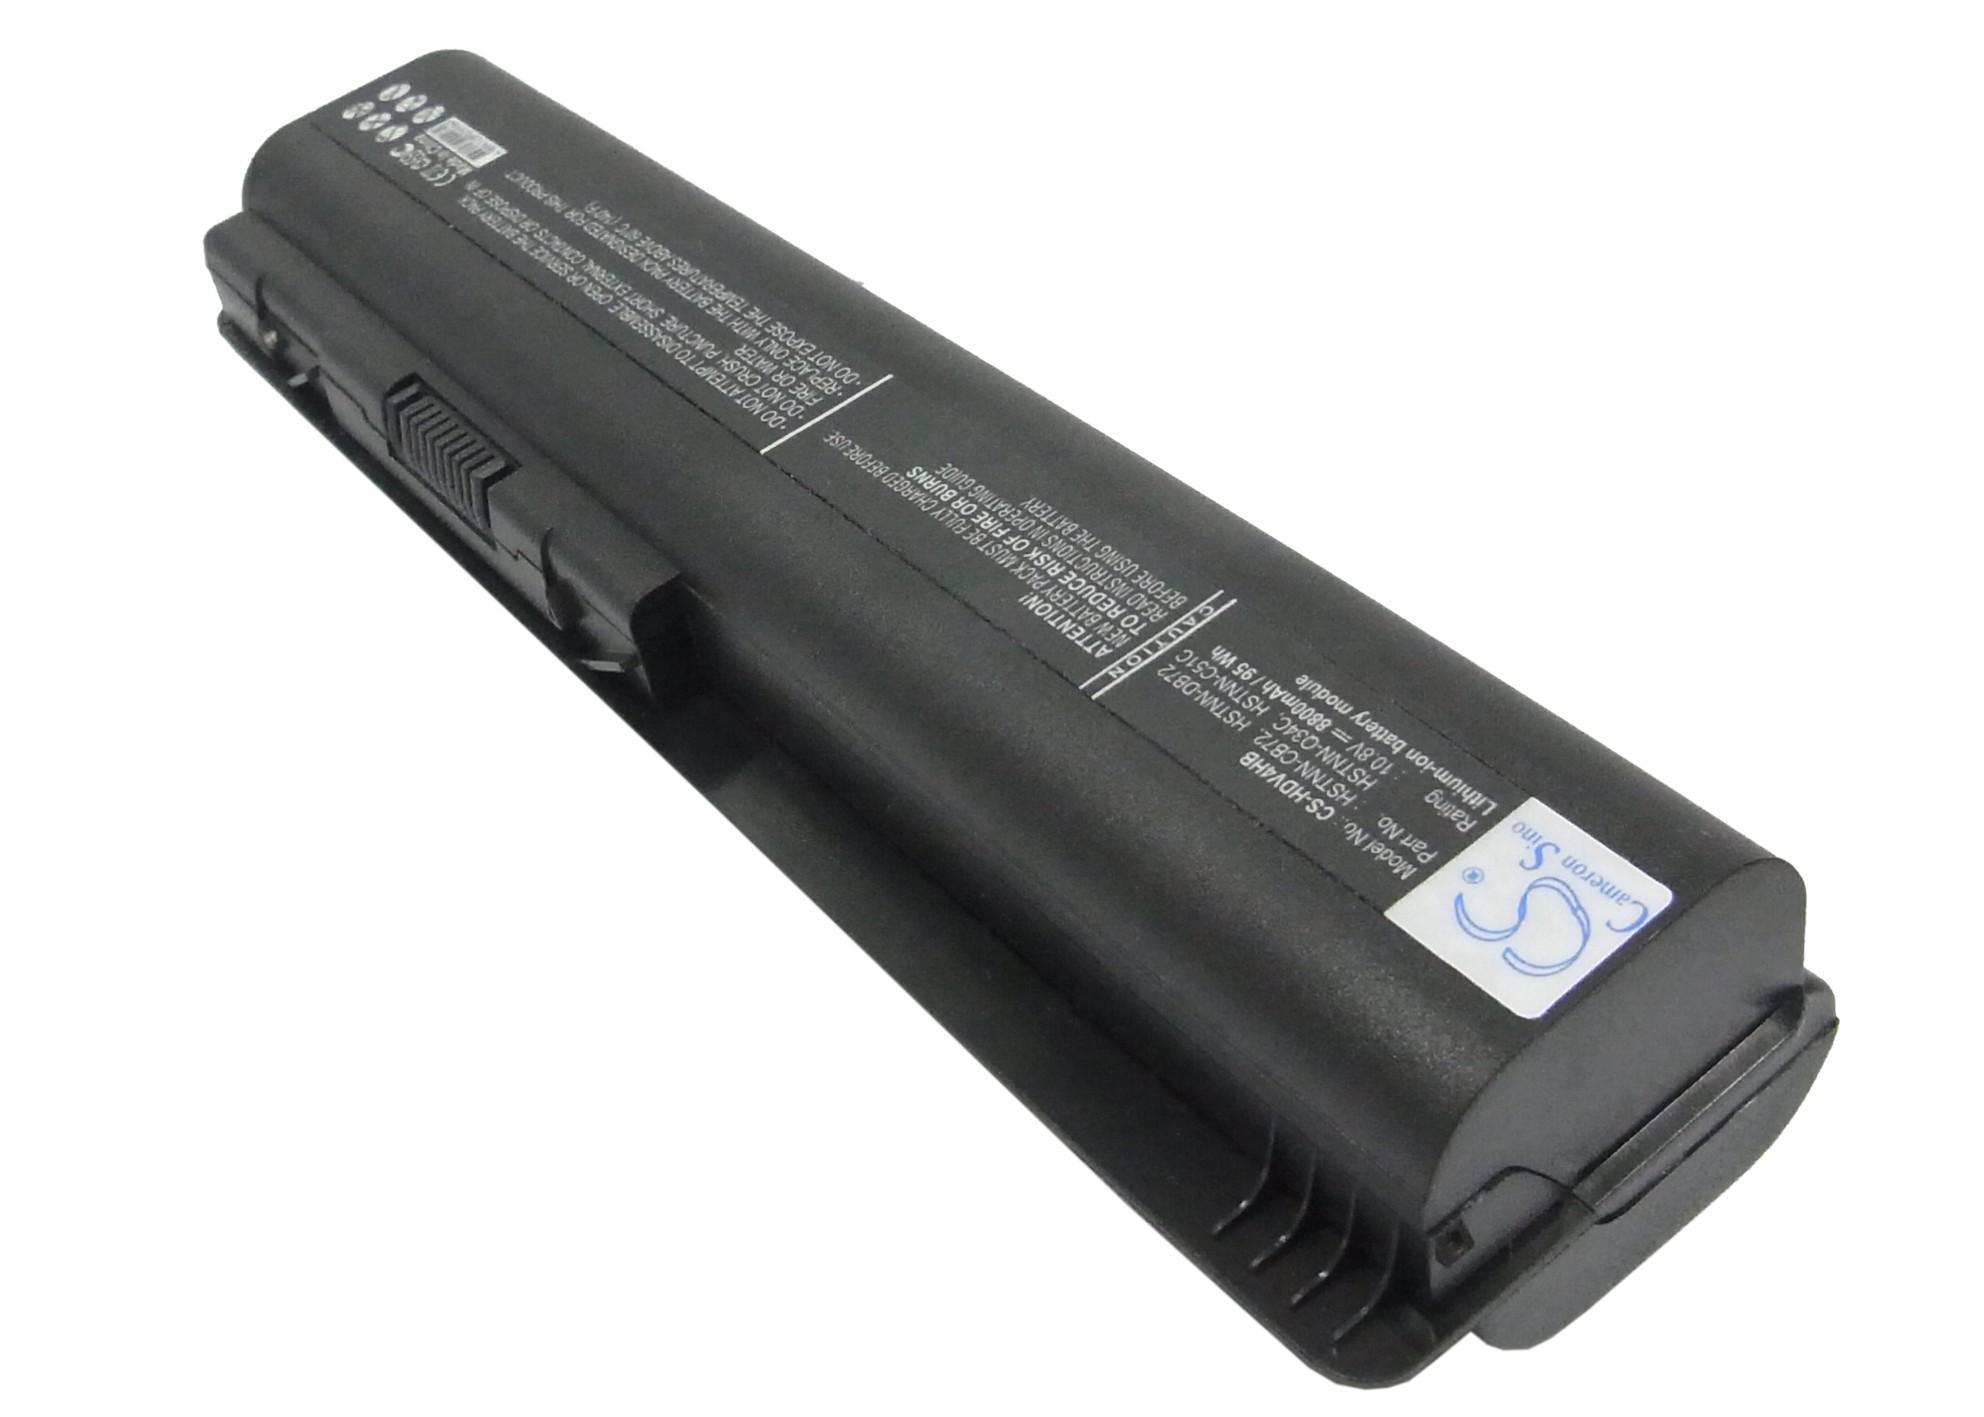 Cameron Sino baterie do notebooků pro COMPAQ Presario CQ60-400 10.8V Li-ion 8800mAh černá - neoriginální